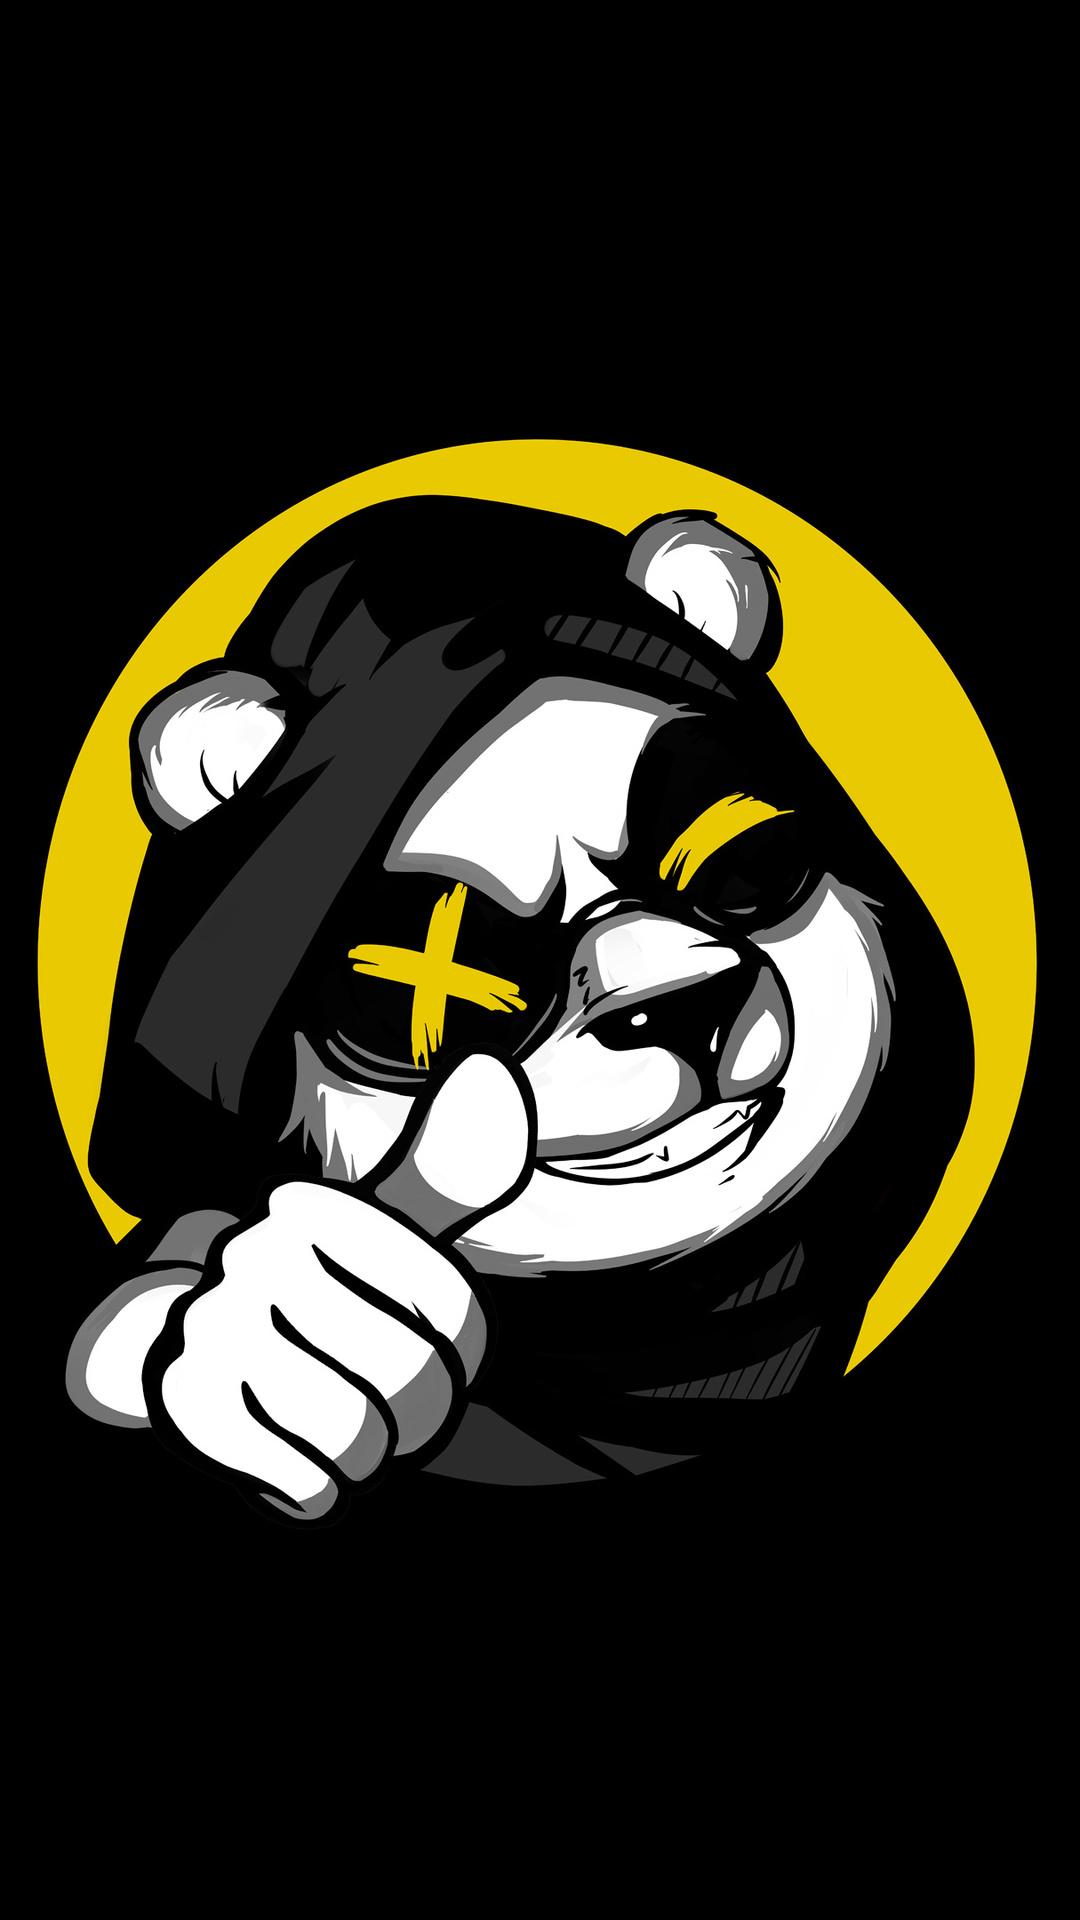 Minimal Cool Panda Thumb Up Wallpaper